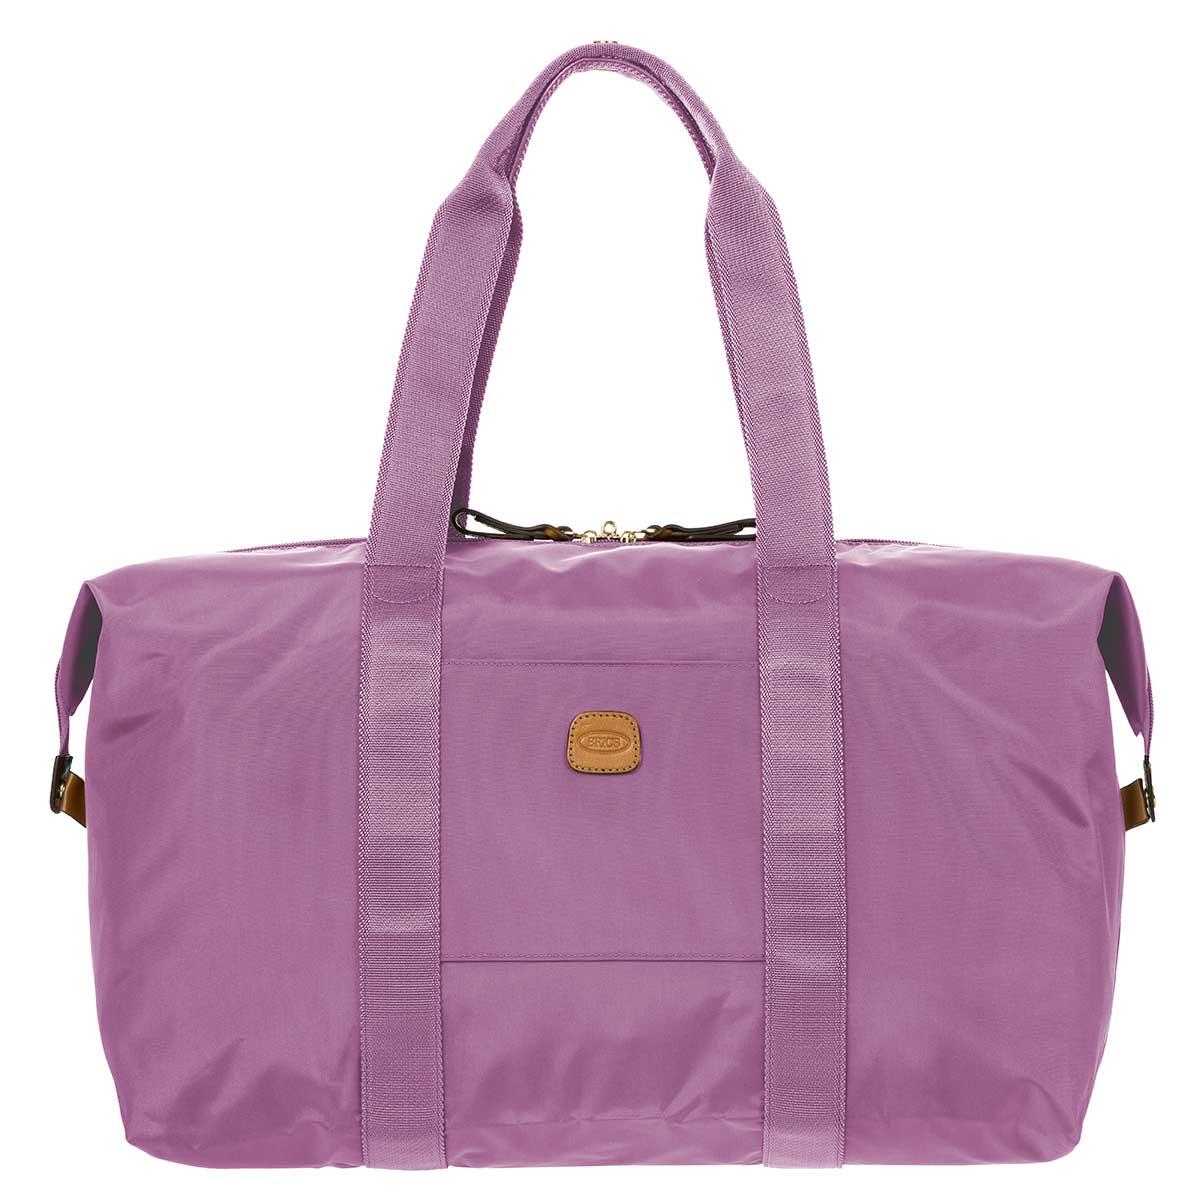 X-Bag 18″ Folding Duffle Bag - Wisteria   BRIC'S Travel Bag